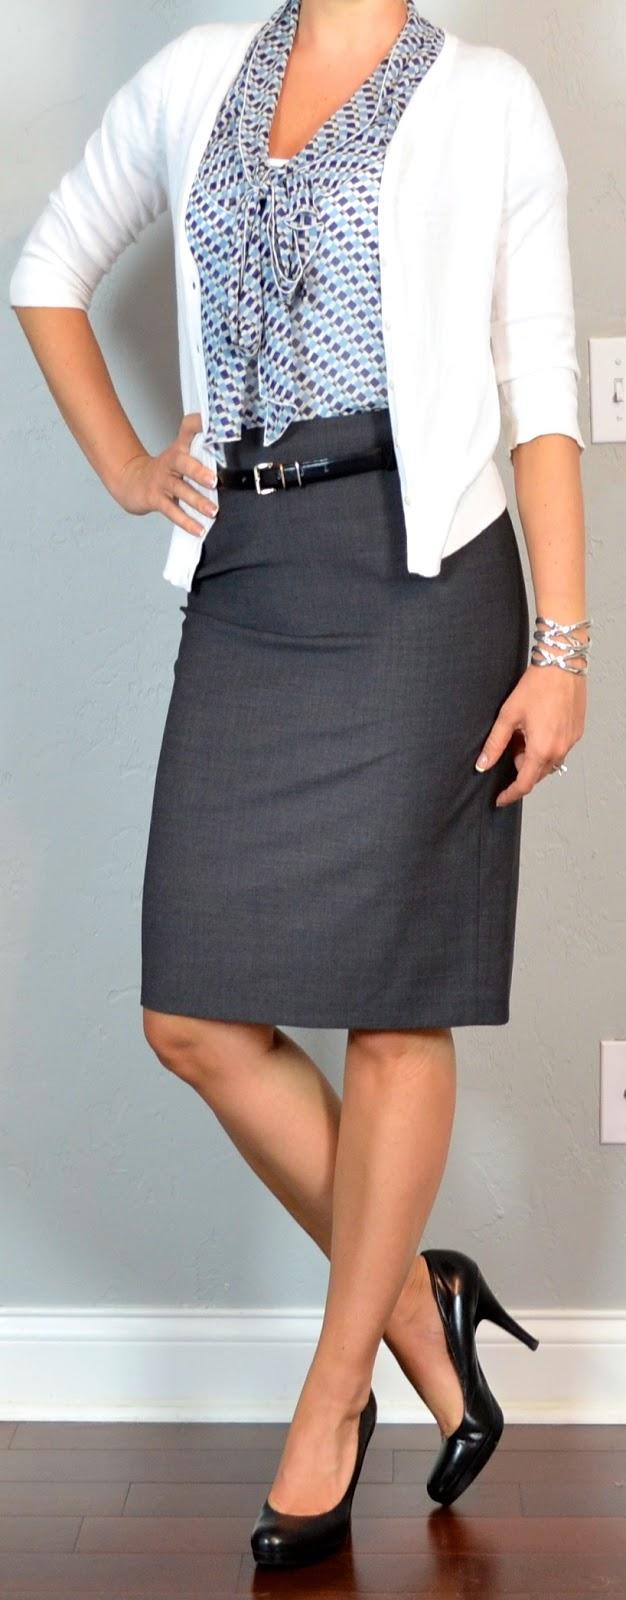 Outfit post grey pencil skirt blue pattern tie-neck blouse white cardigan black pumps ...